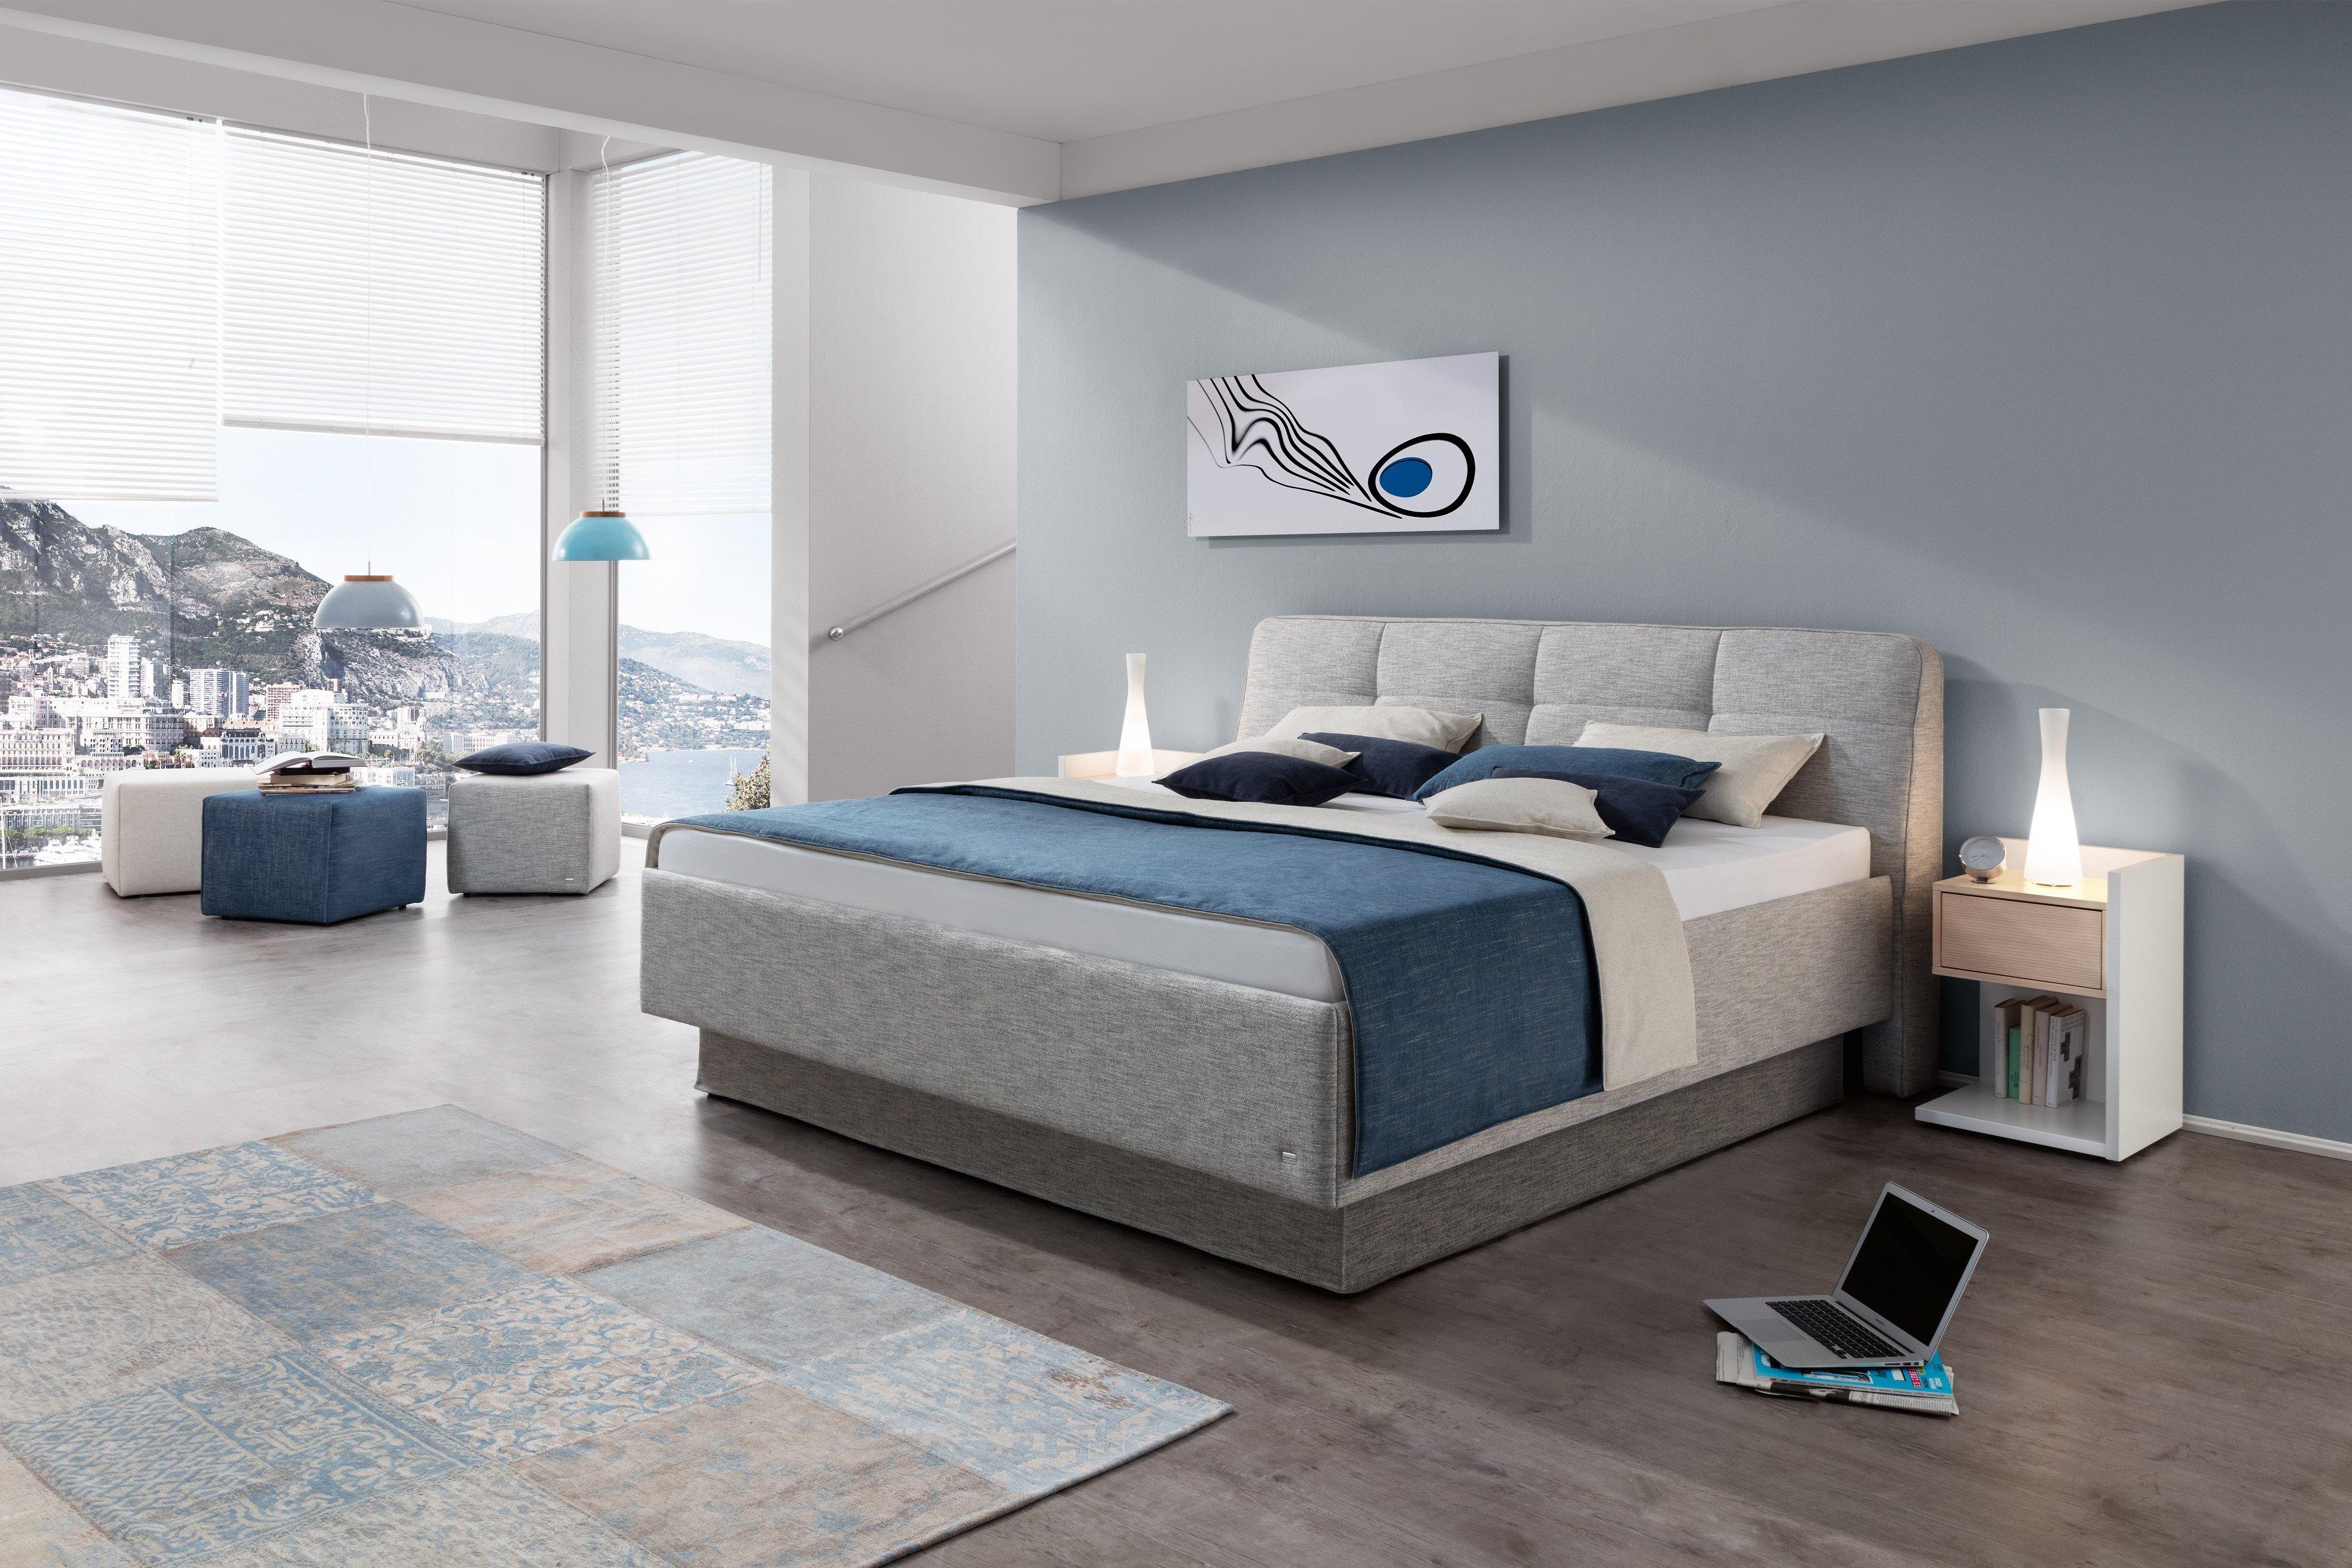 ruf betten online kaufen ruf betten online kaufen 1 deutsche dekor 2017 online dekoration. Black Bedroom Furniture Sets. Home Design Ideas